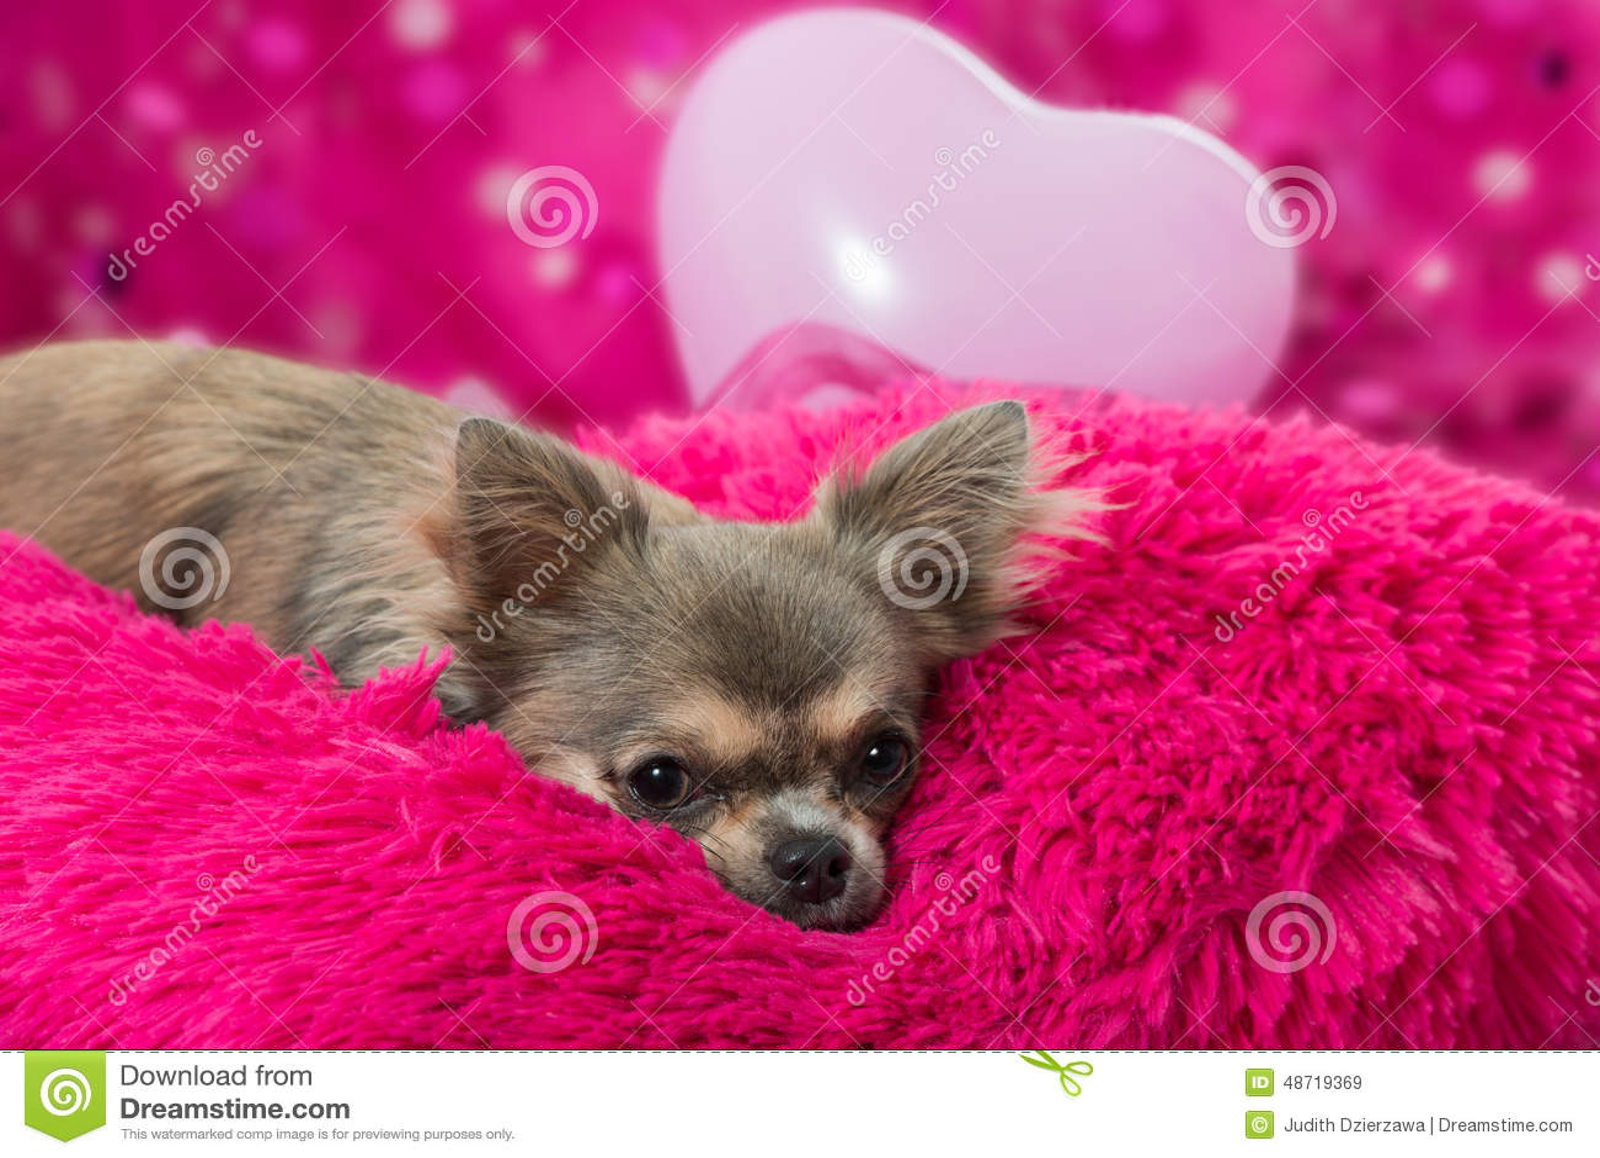 Pink Chihuahua Stock Photo Image 48719369